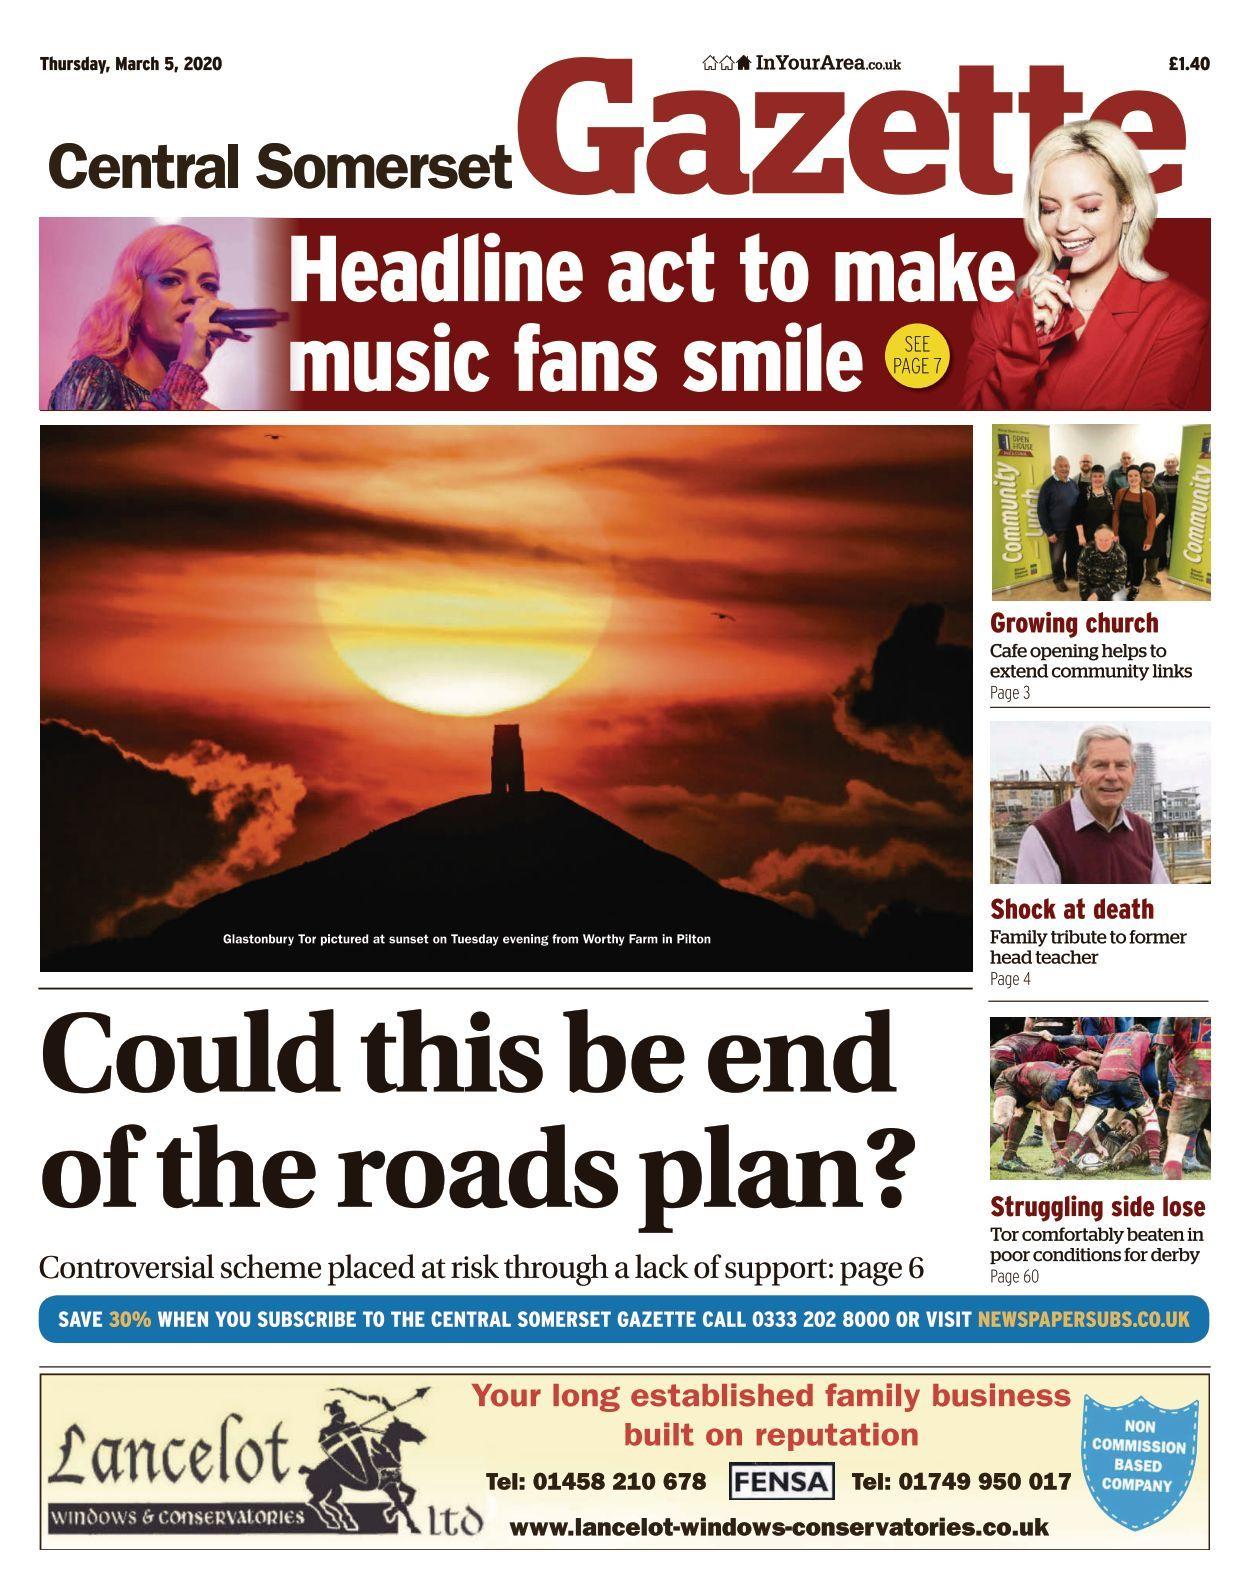 Central Somerset Gazette   50 50 50